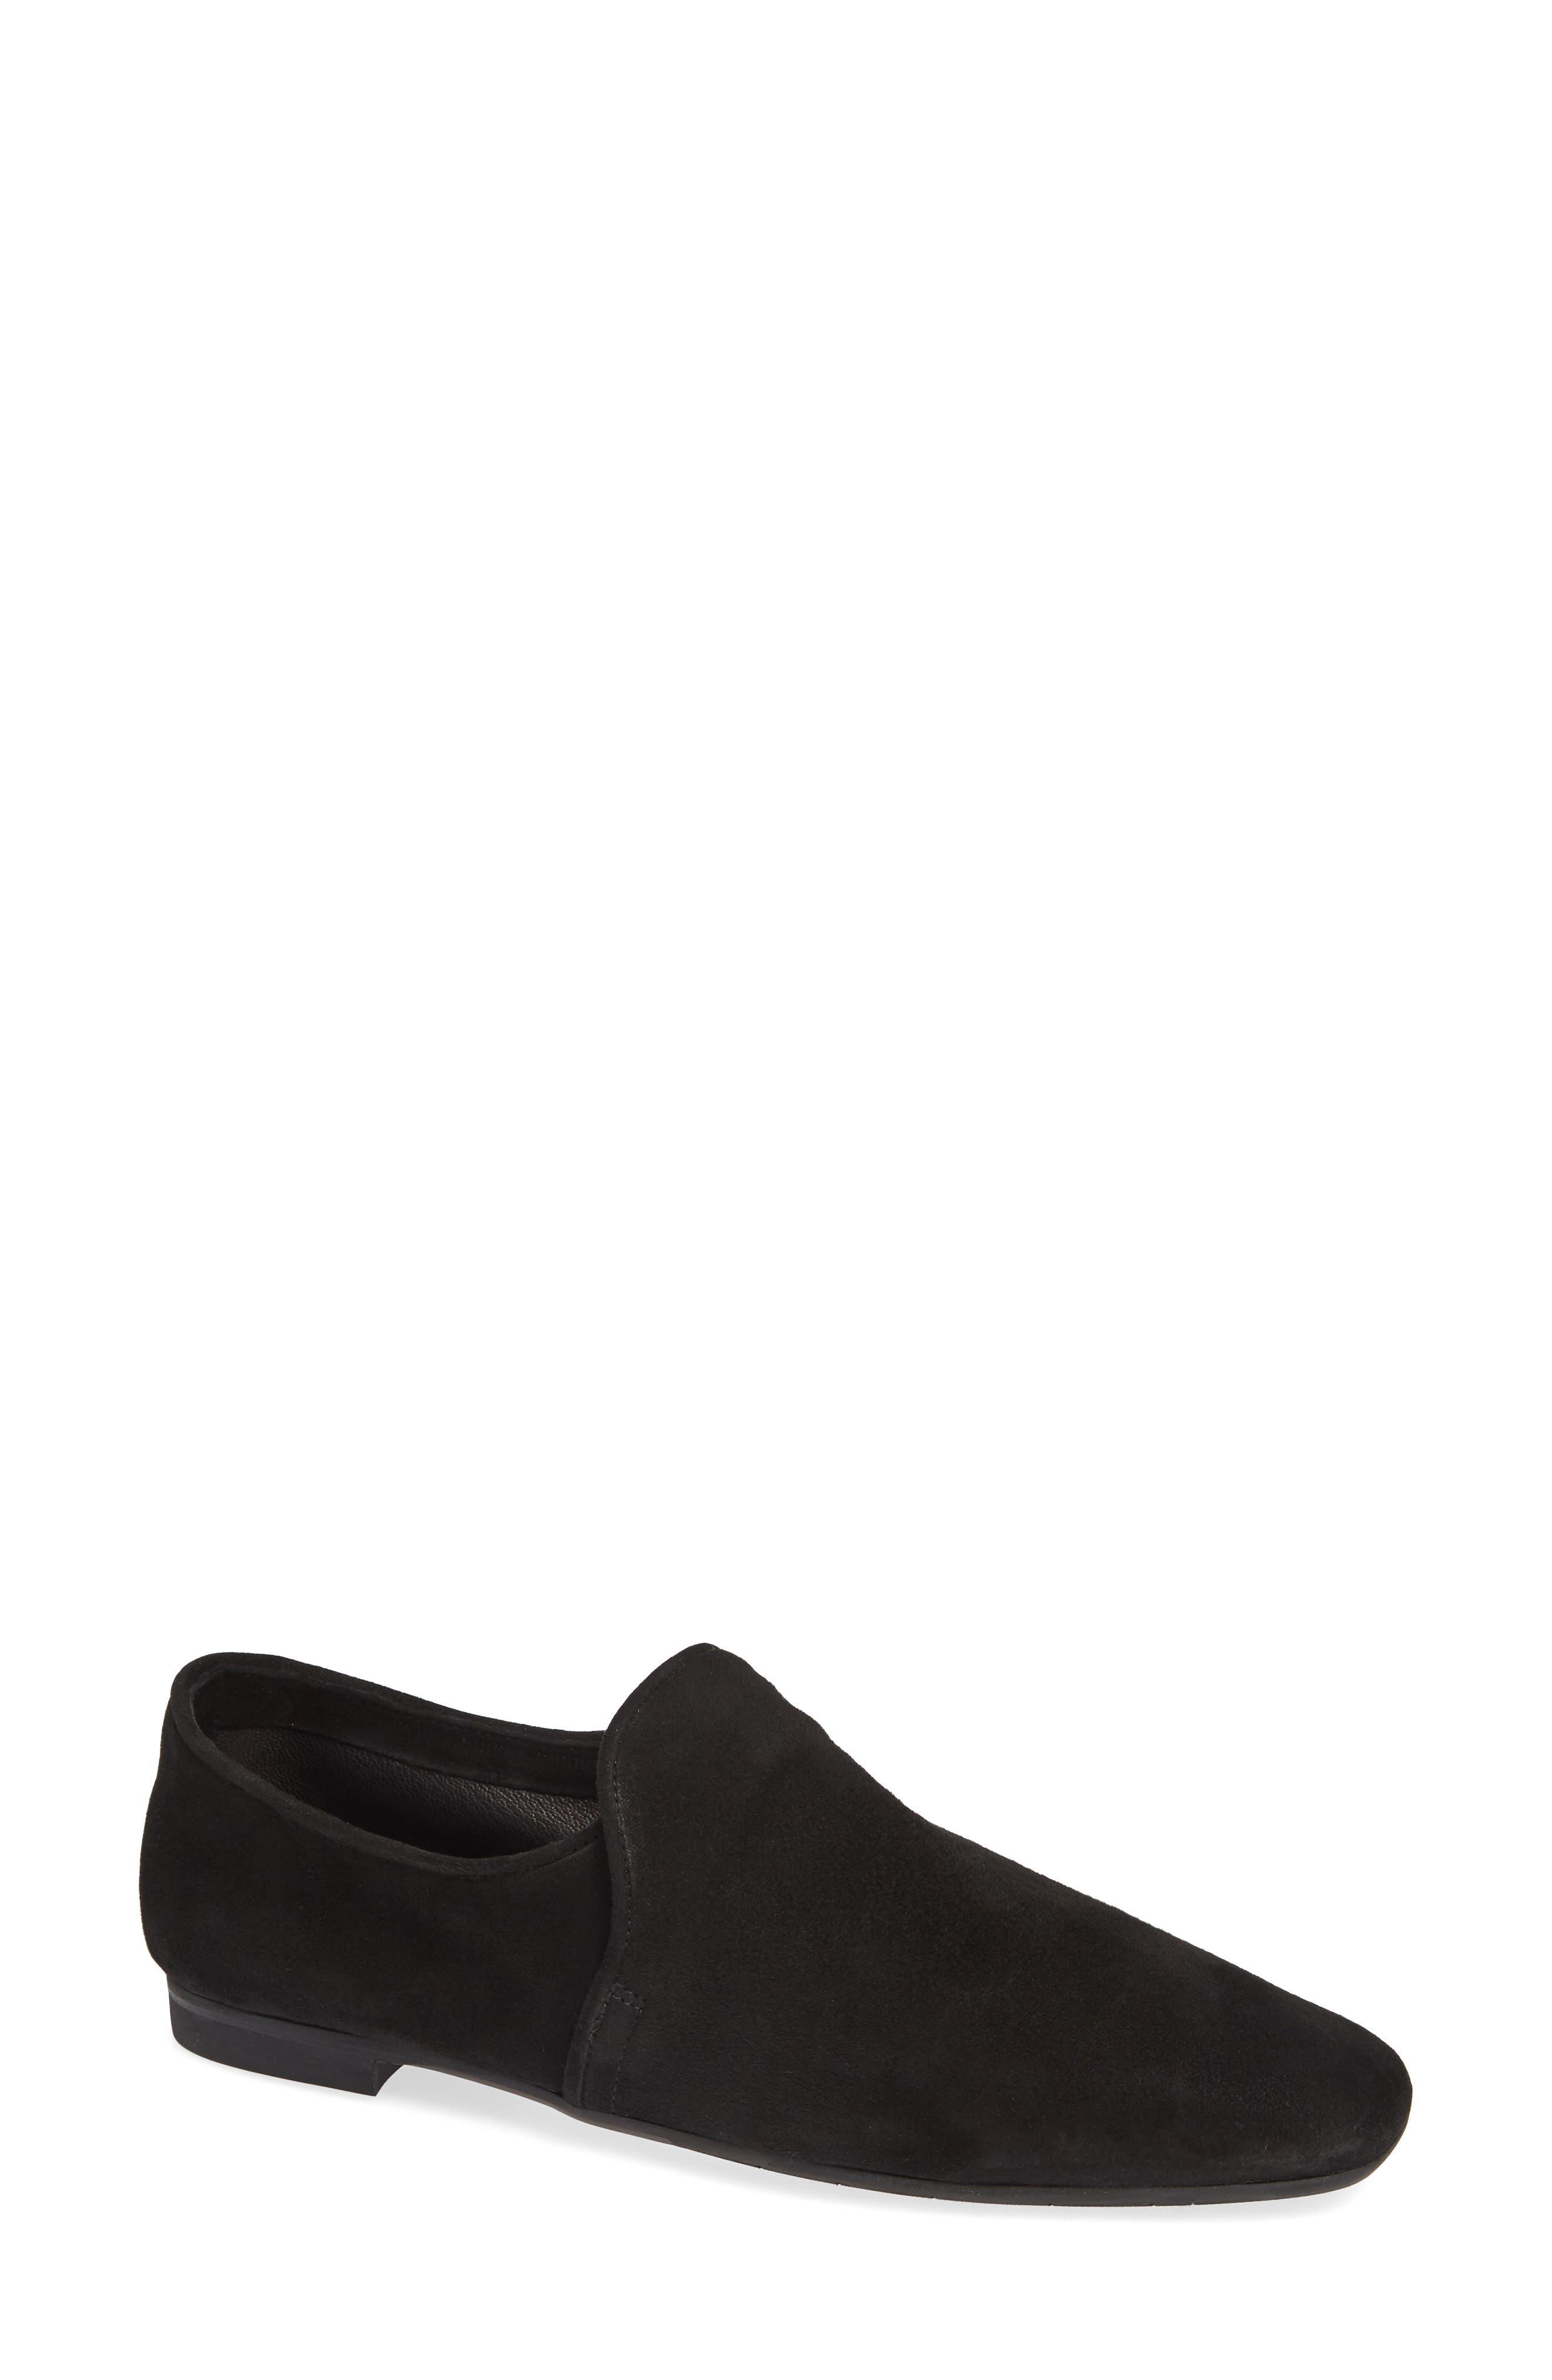 AQUATALIA Revvy Weatherproof Loafer, Main, color, BLACK SUEDE